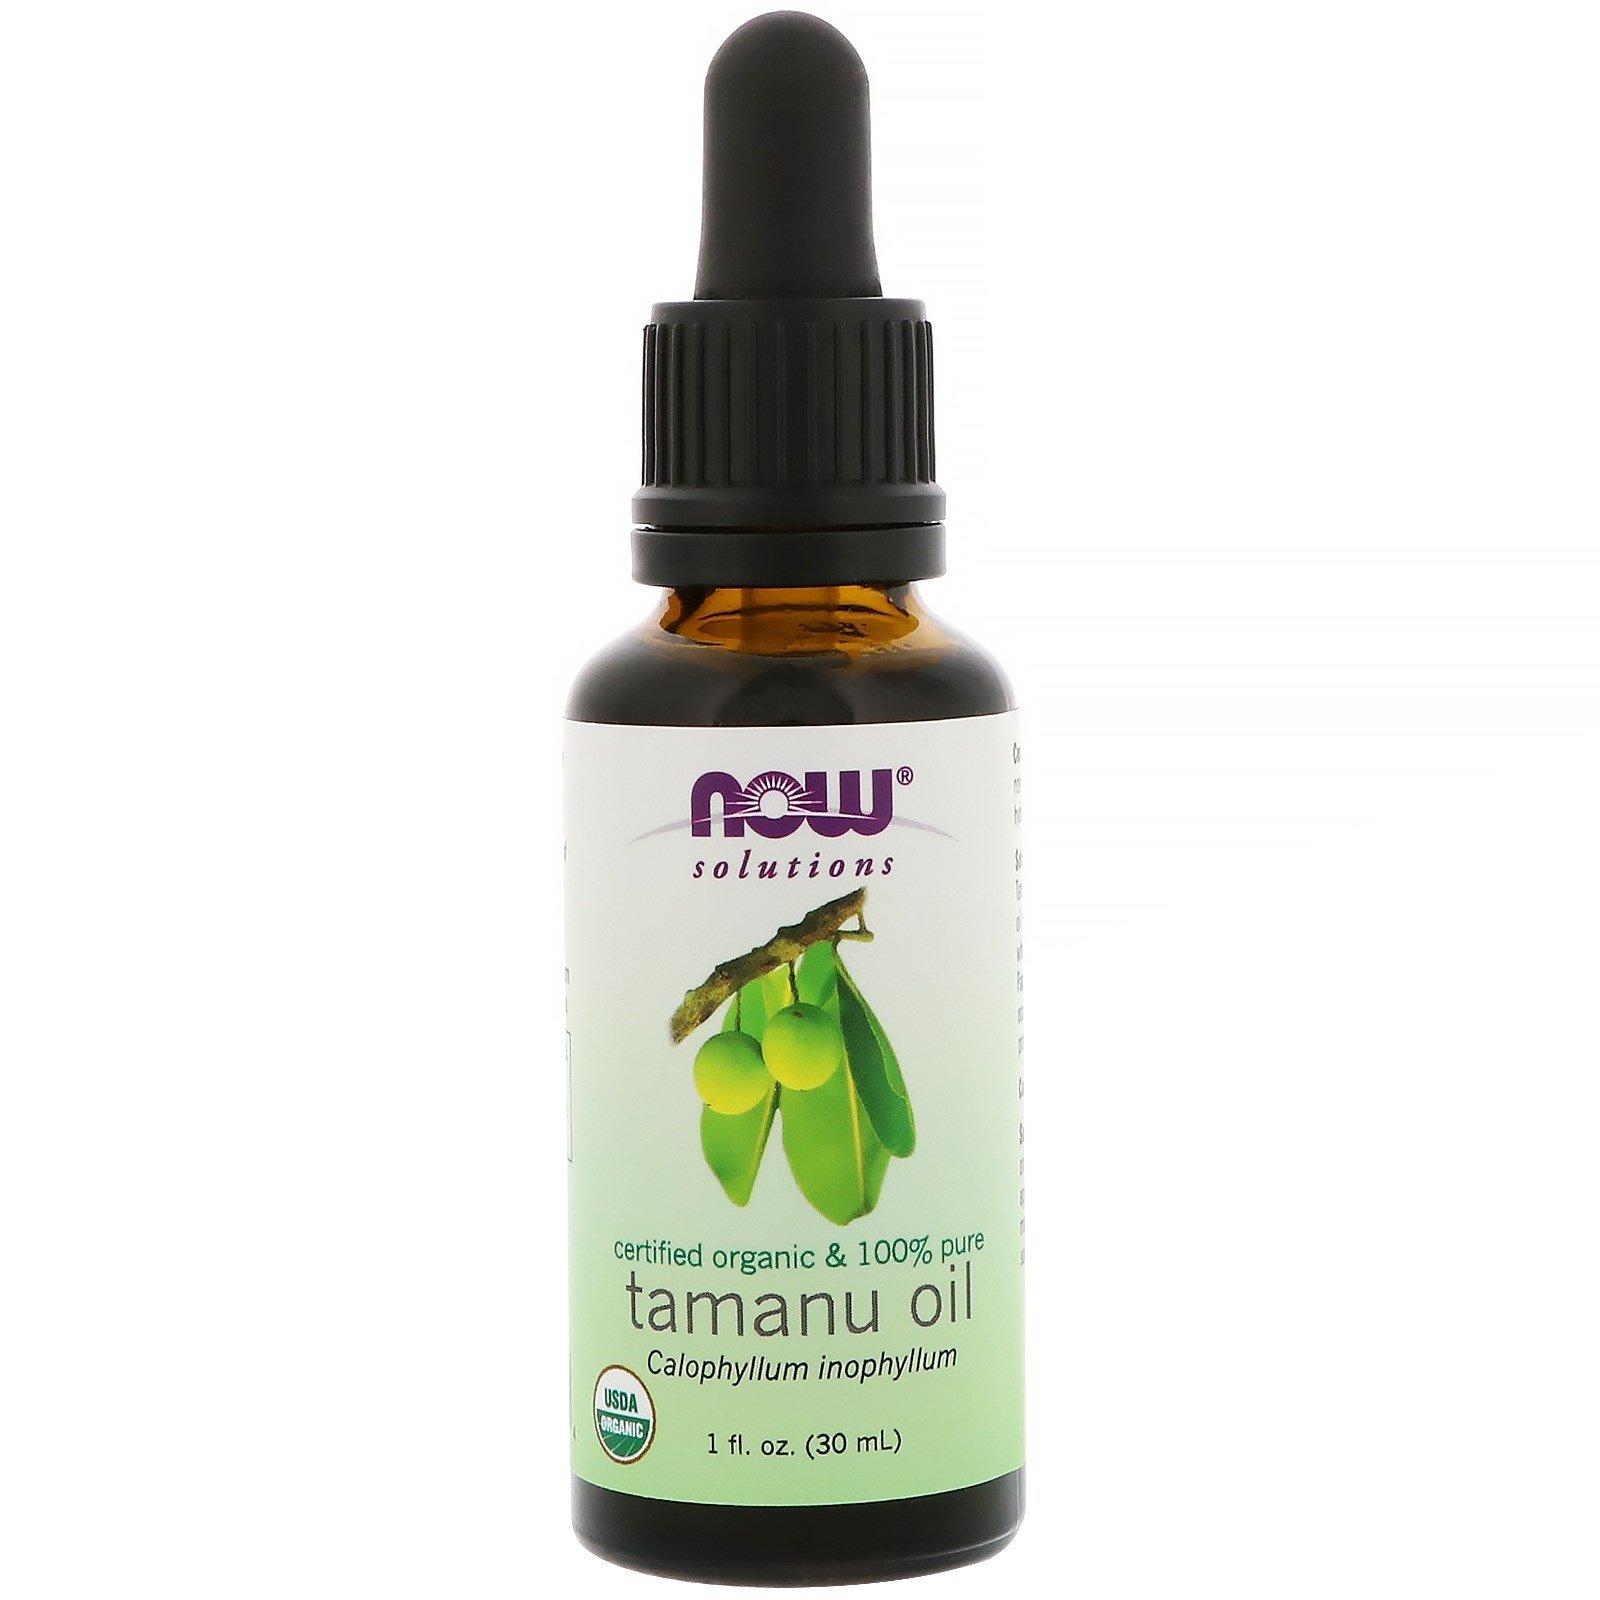 Image of Certified Organic & 100% Pure- Tamanu Oil (30 ml) - Now Foods 0733739077394